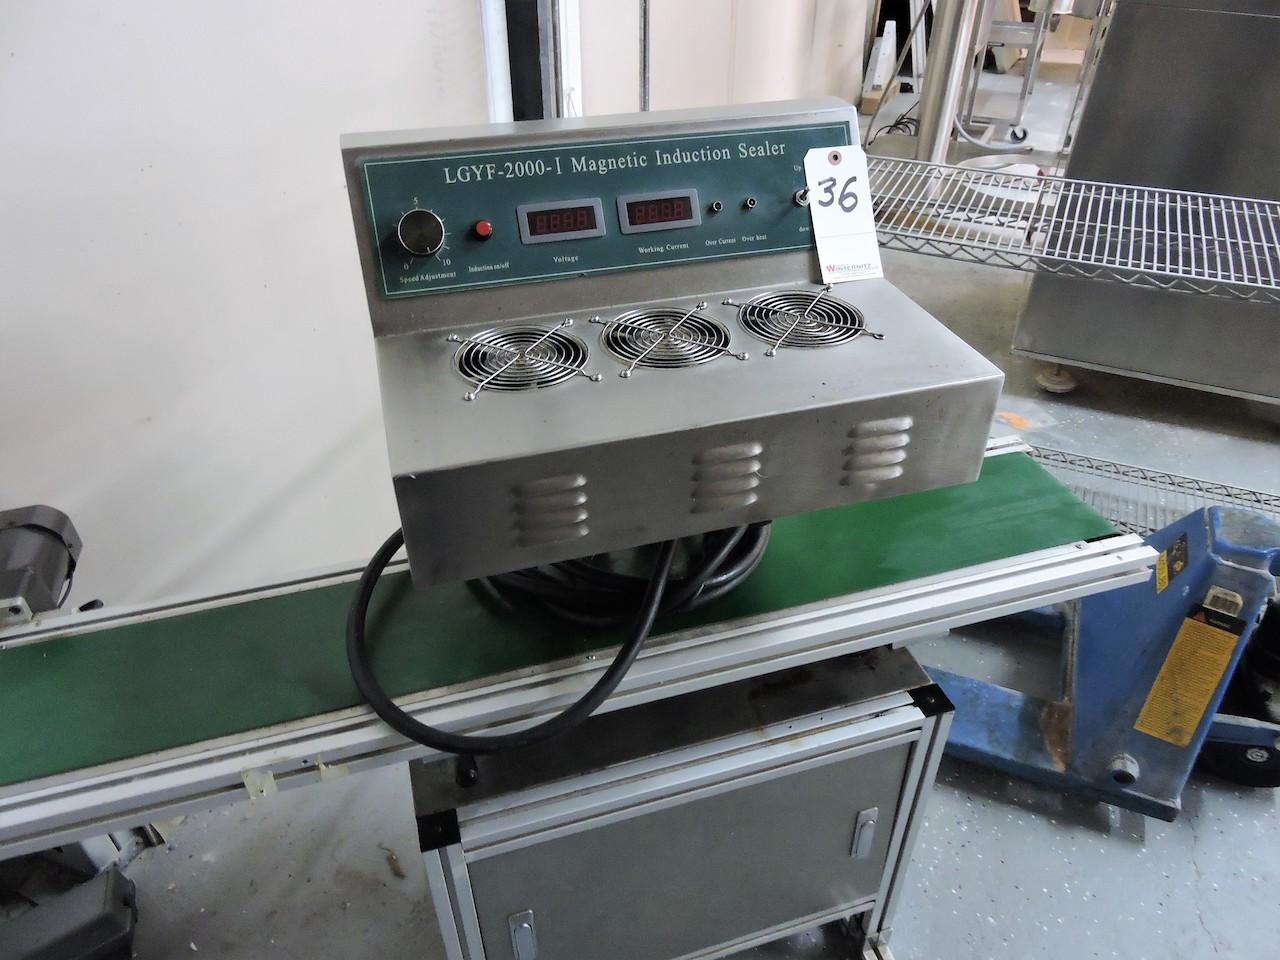 Lot 36 - LGYF 2000 I MAGNETIC INDUCTION SEALER